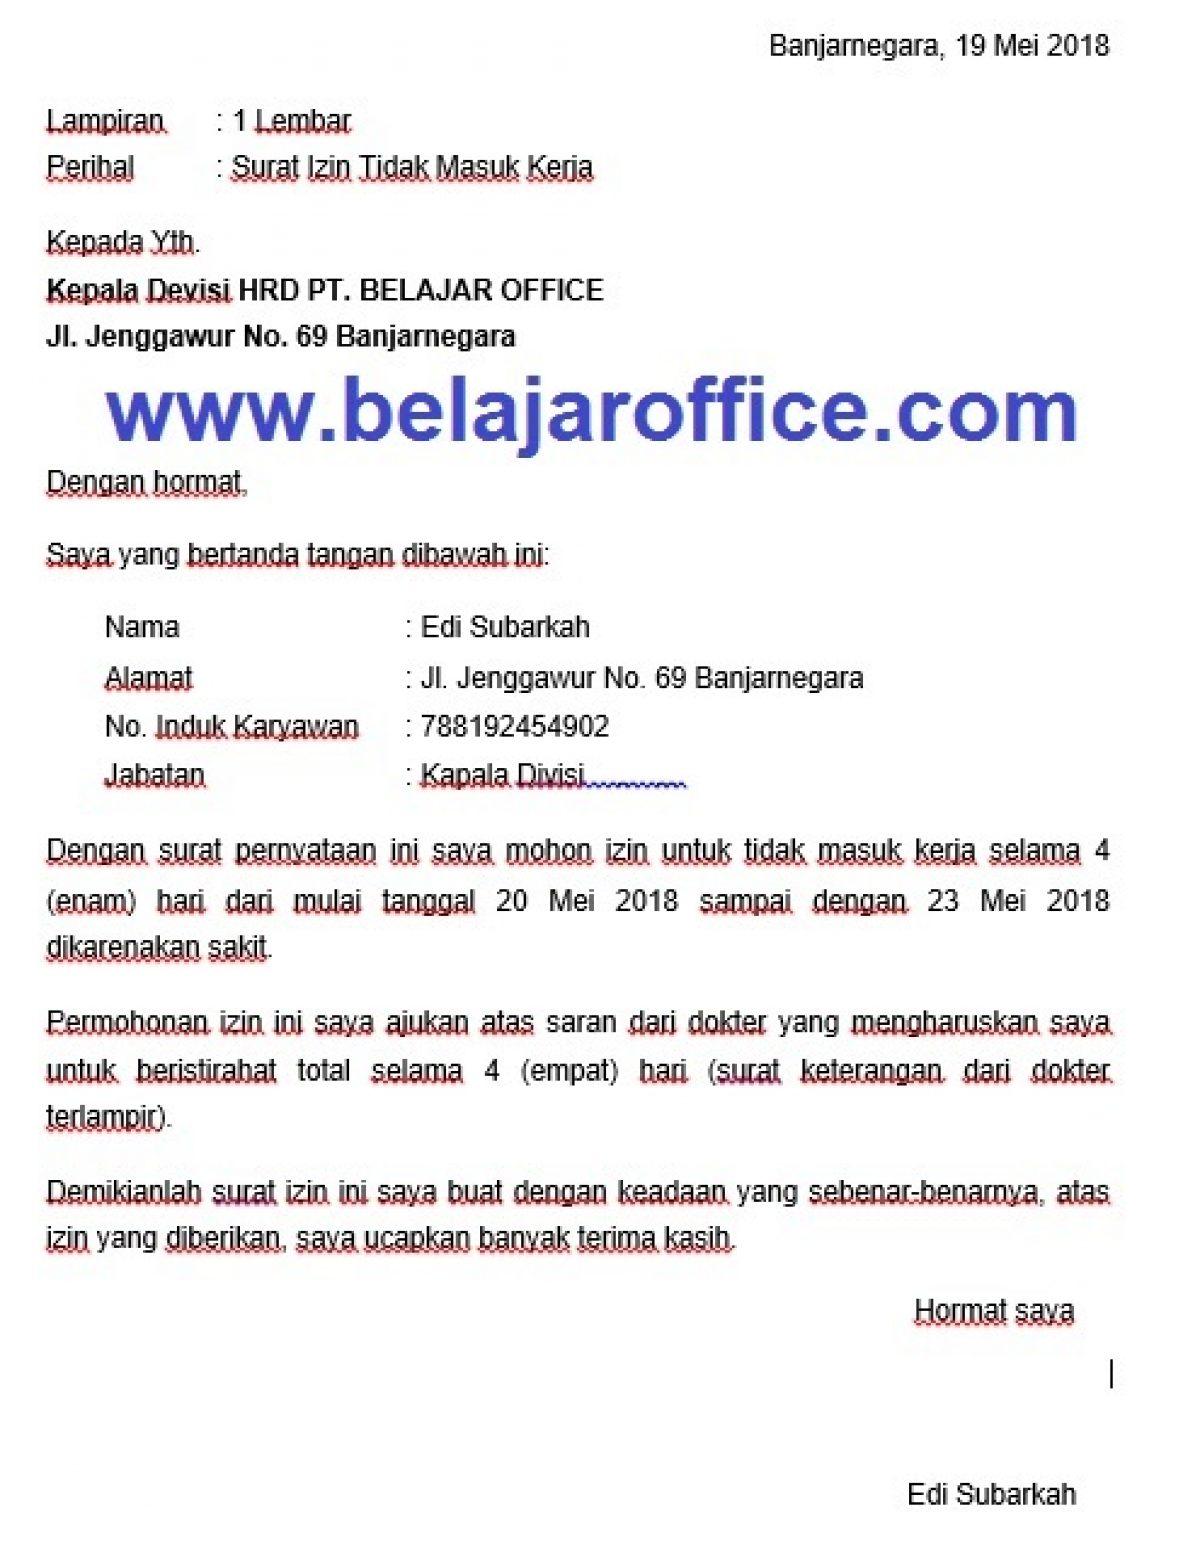 Contoh Surat Izin Tidak Masuk Kerja | Belajar Office